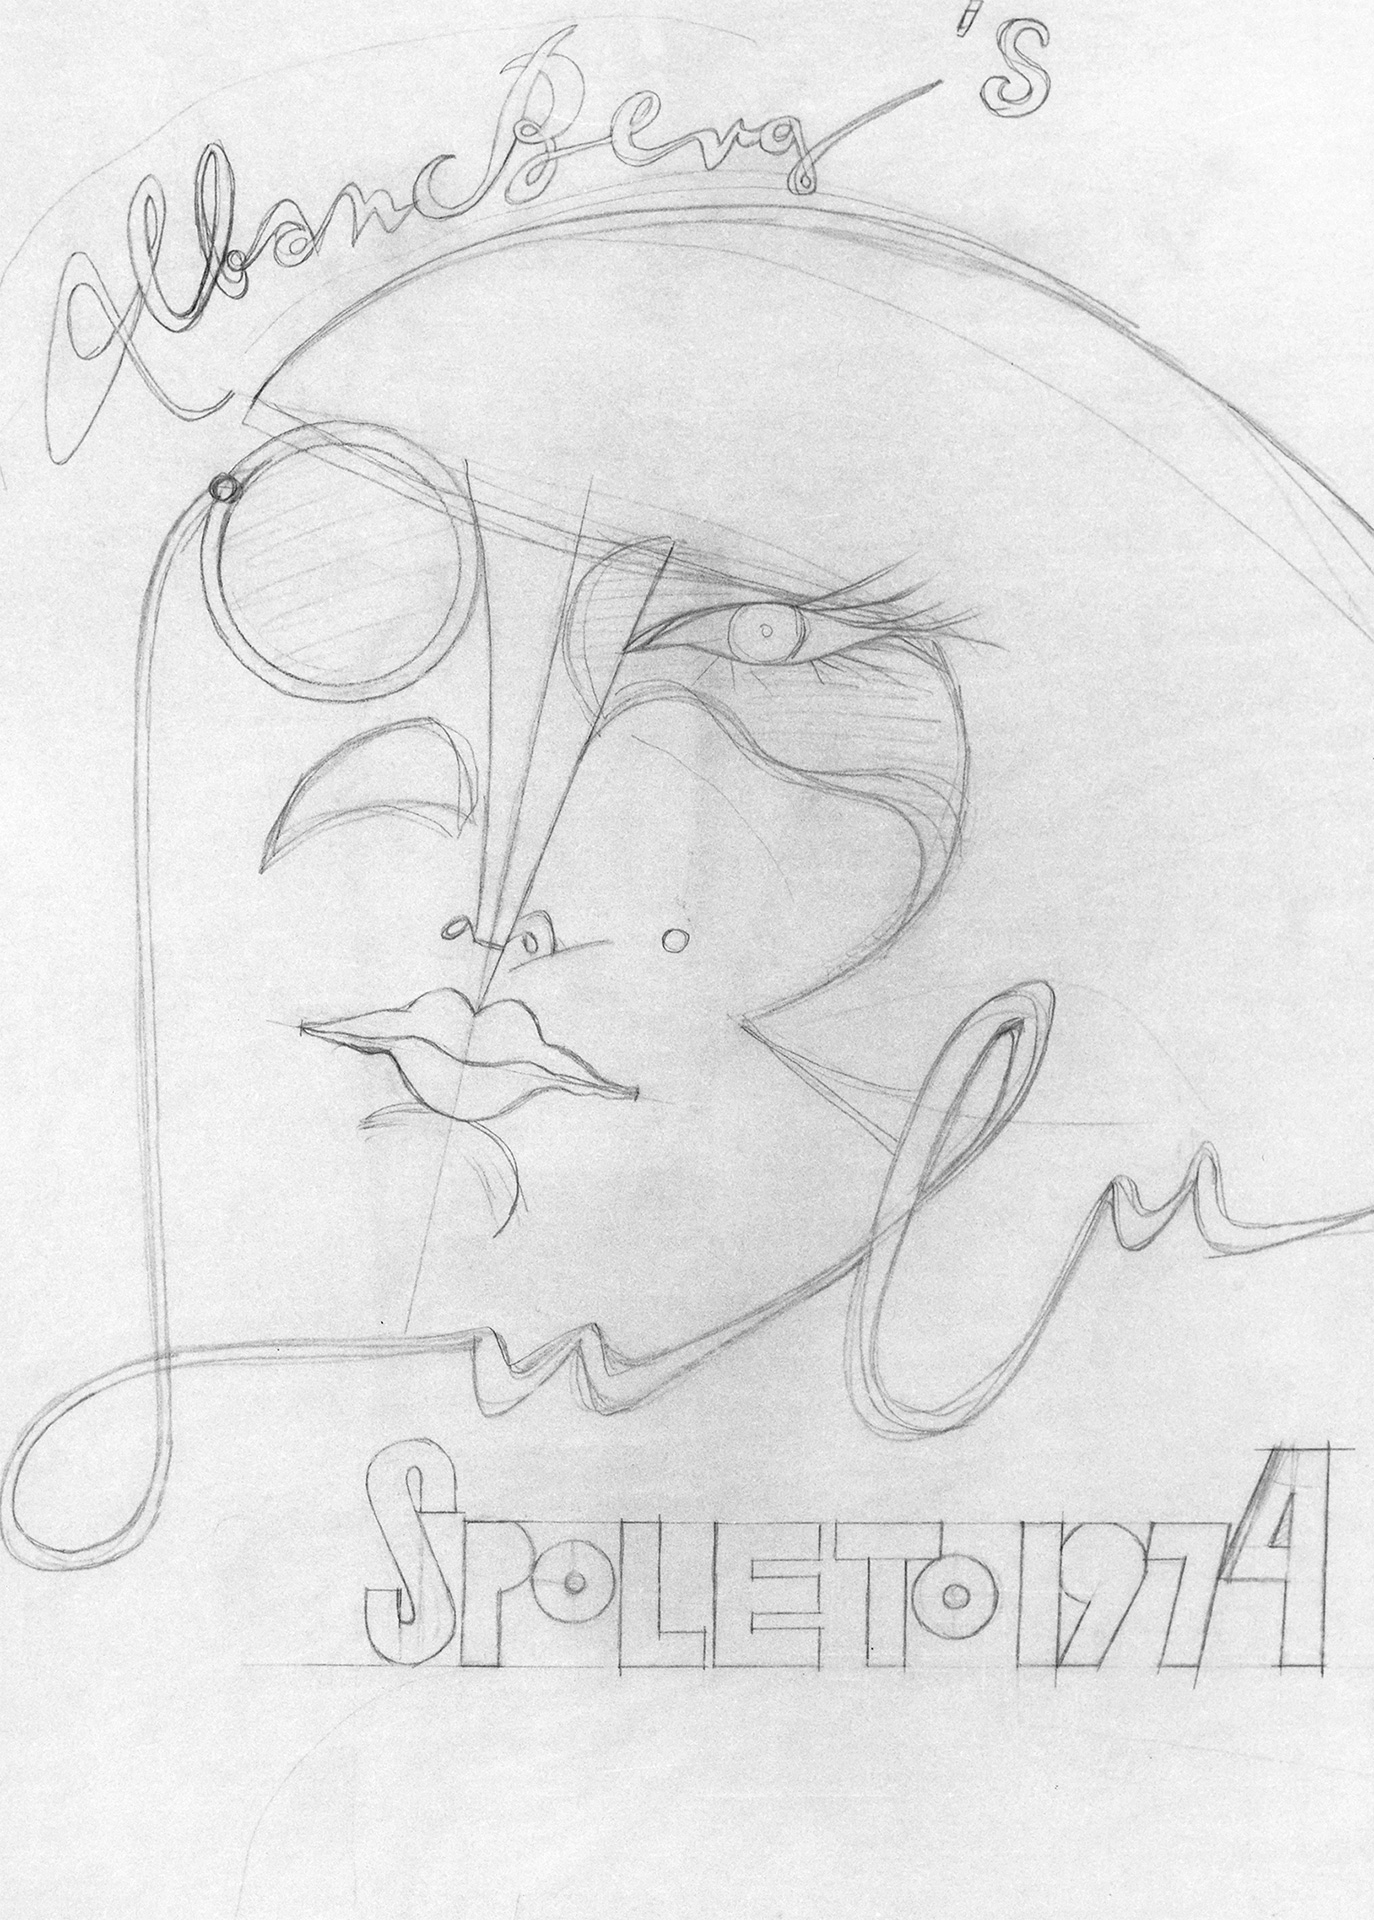 Spoletto (Alan Berg), 1974